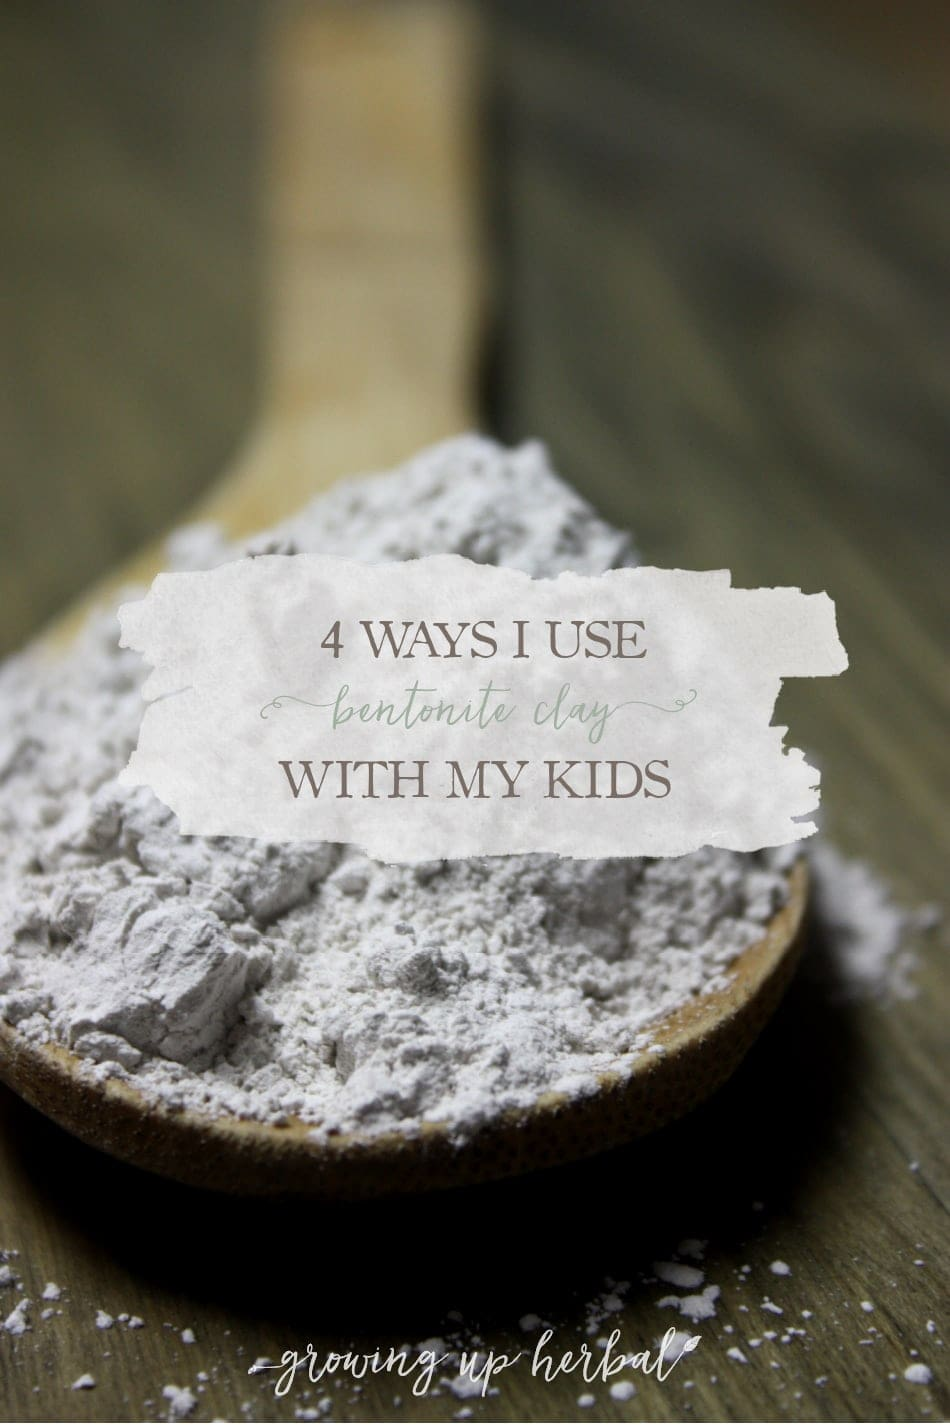 4 Ways I Use Bentonite Clay With My Kids